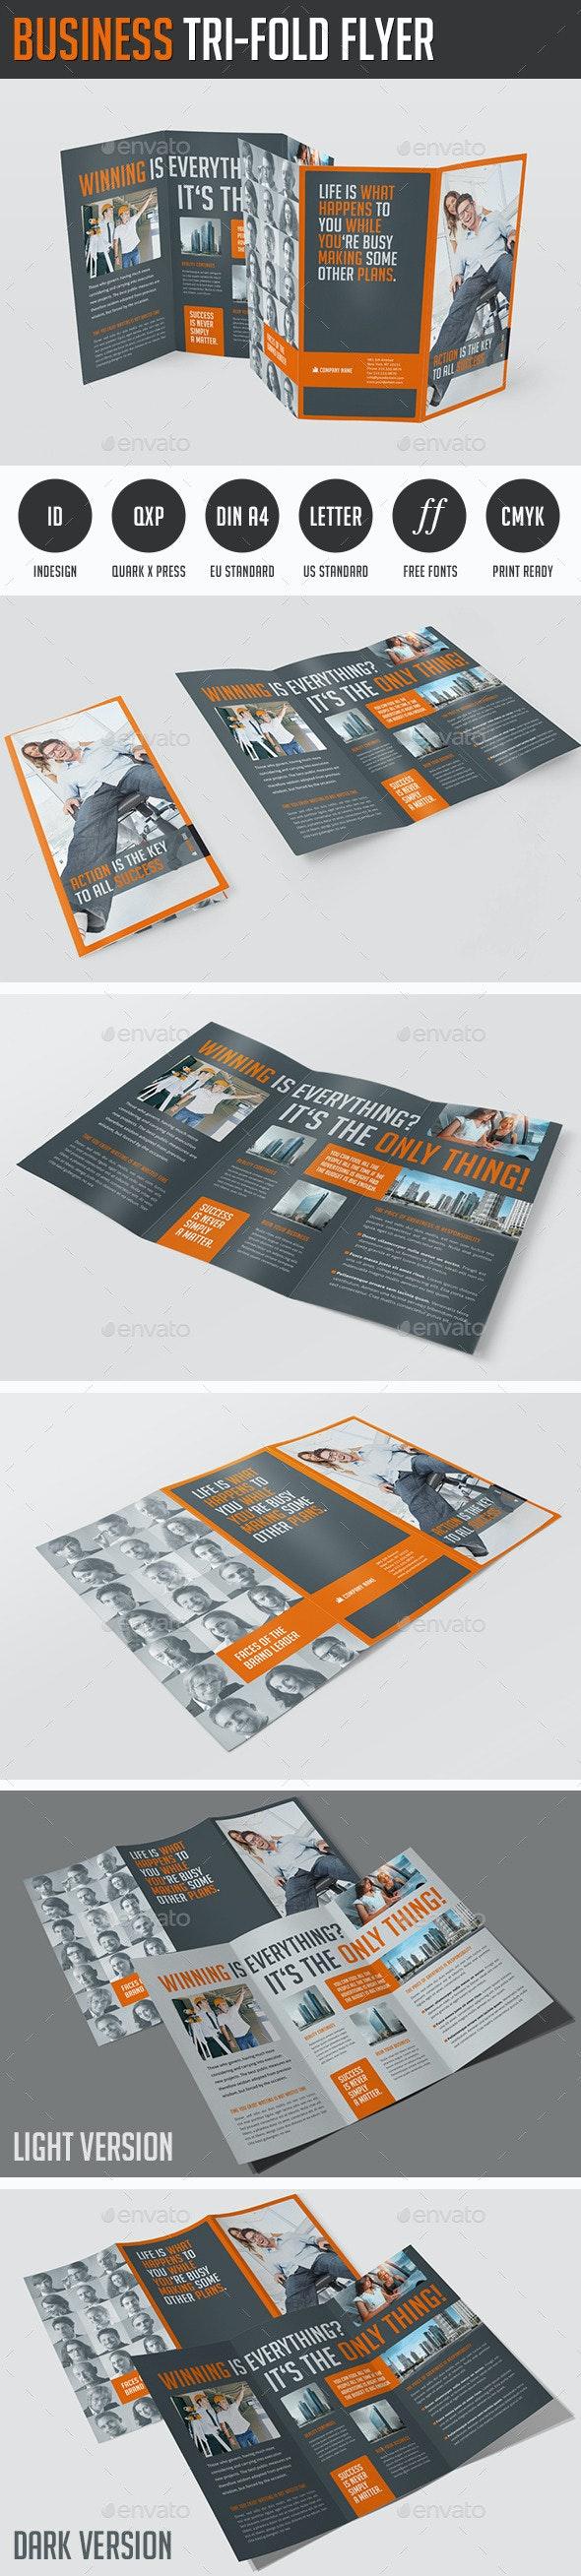 Business Tri-Fold Flyer - Corporate Brochures